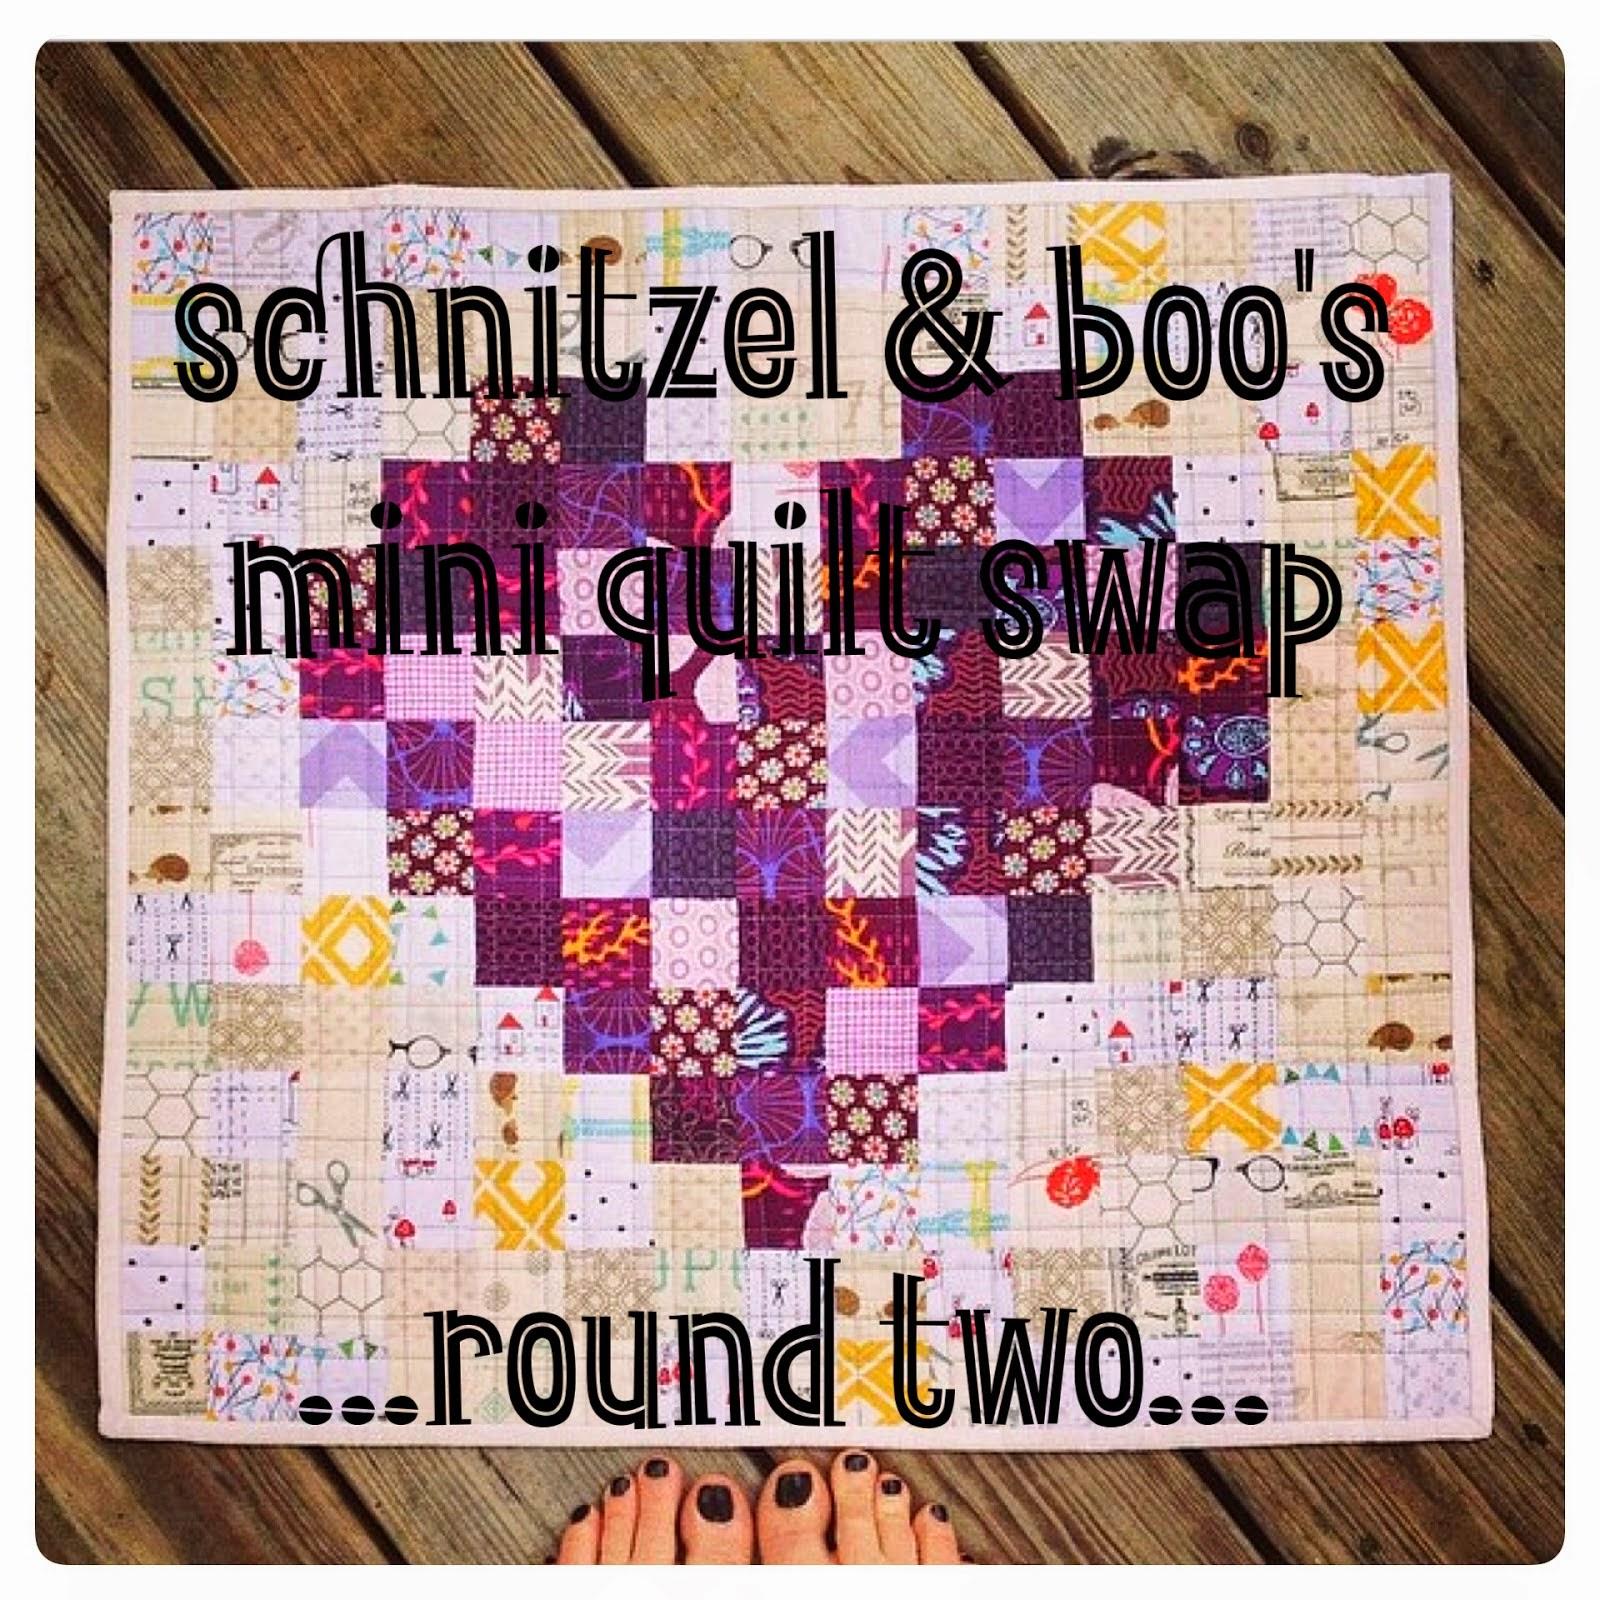 http://www.schnitzelandboo.com/2014/05/schnitzel-boo-mini-quilt-swap-round-two.html